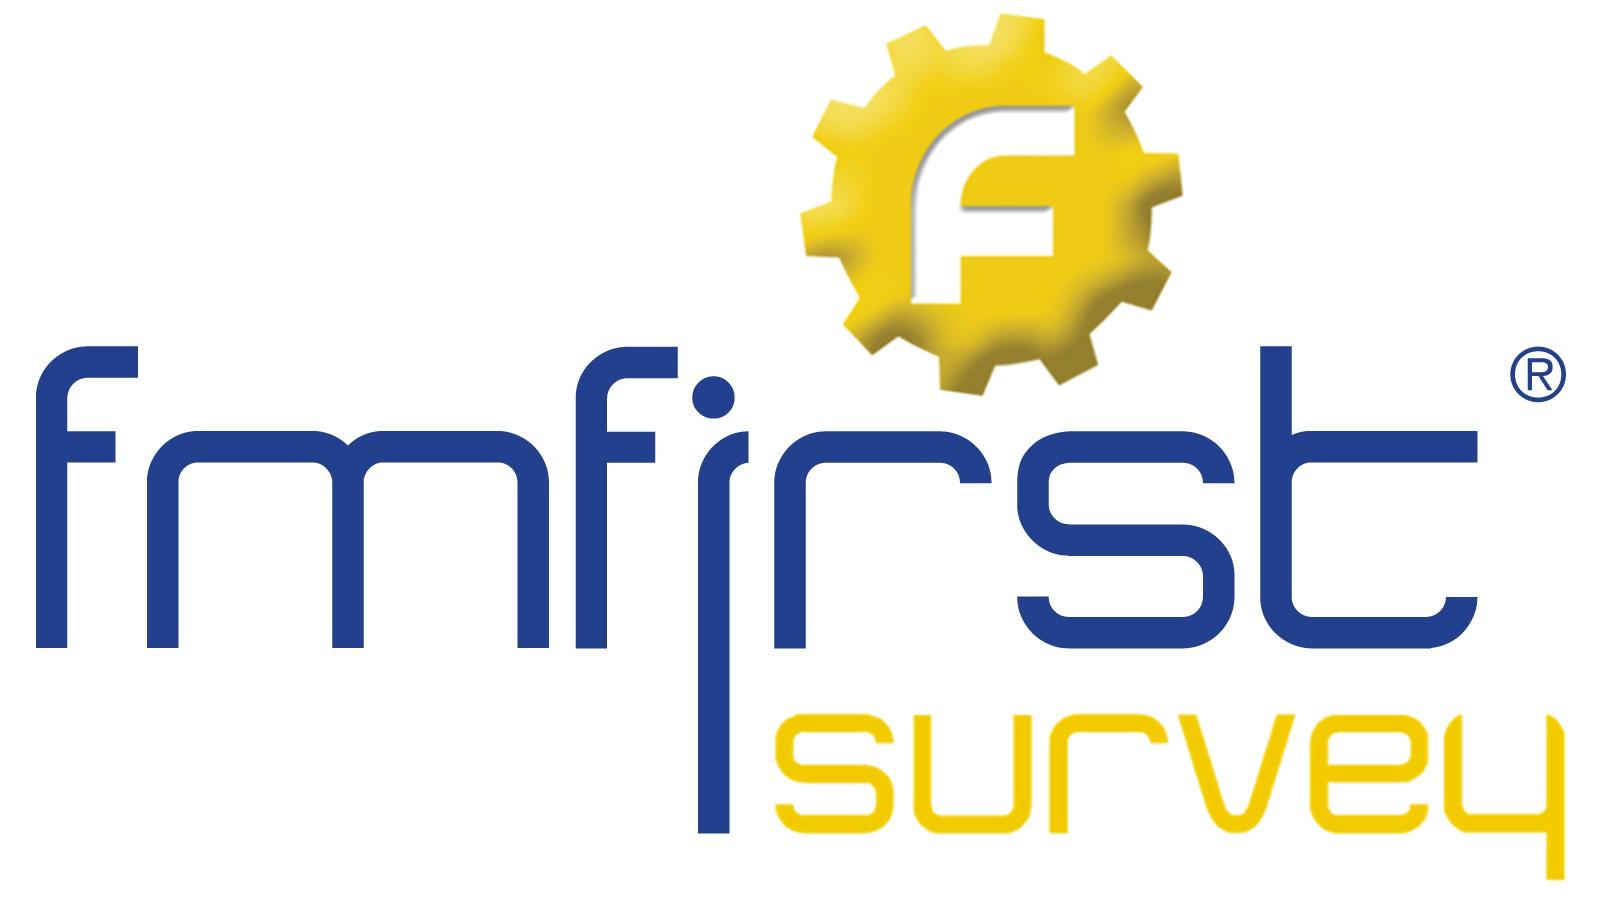 Facilities Management Software - fmfirst survey